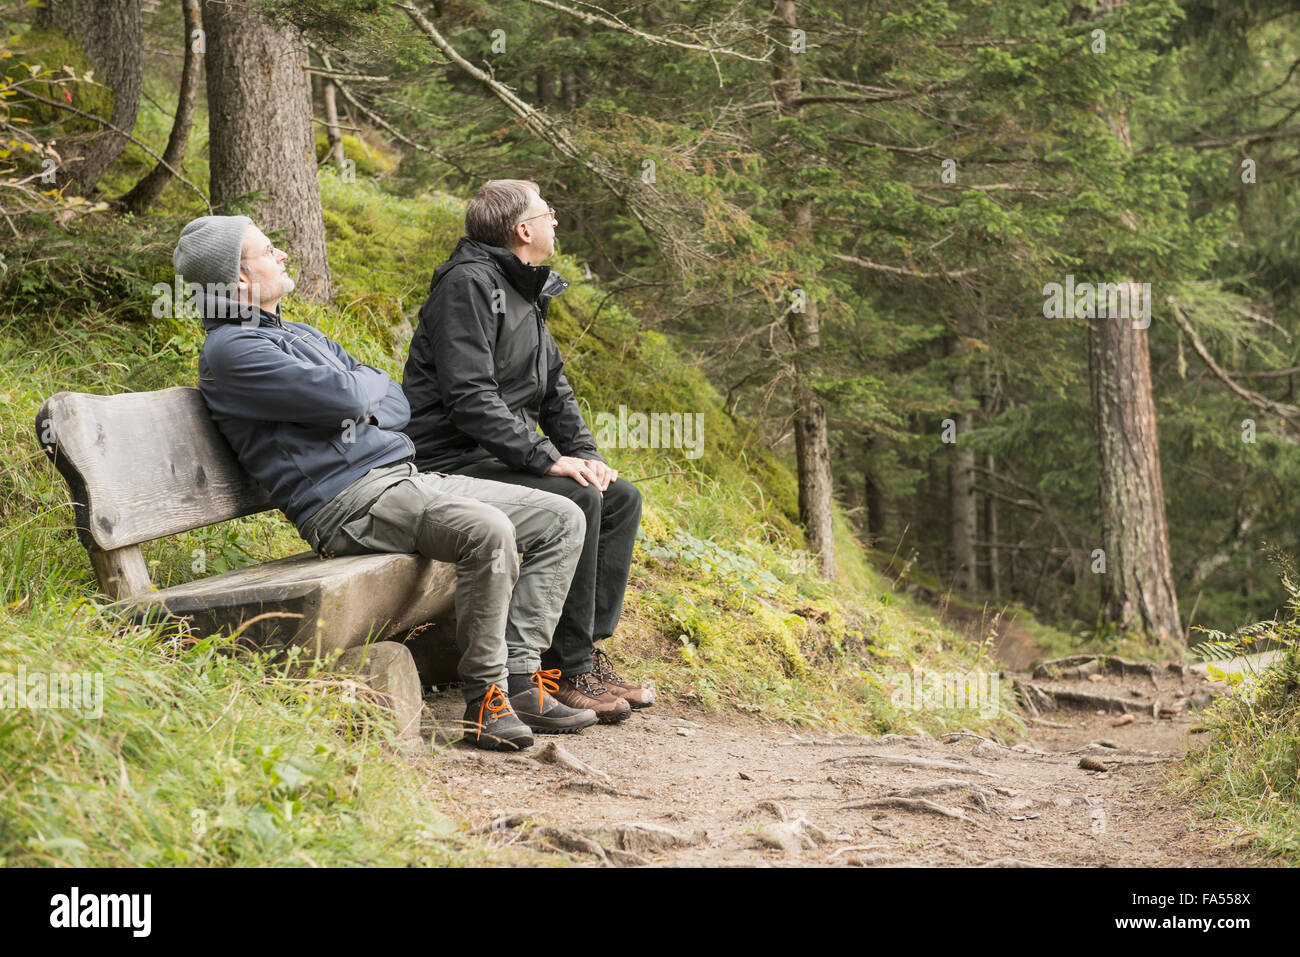 Dos excursionistas madura descansando sobre banco en bosque, Alpes Austríacos, Carintia, Austria Imagen De Stock